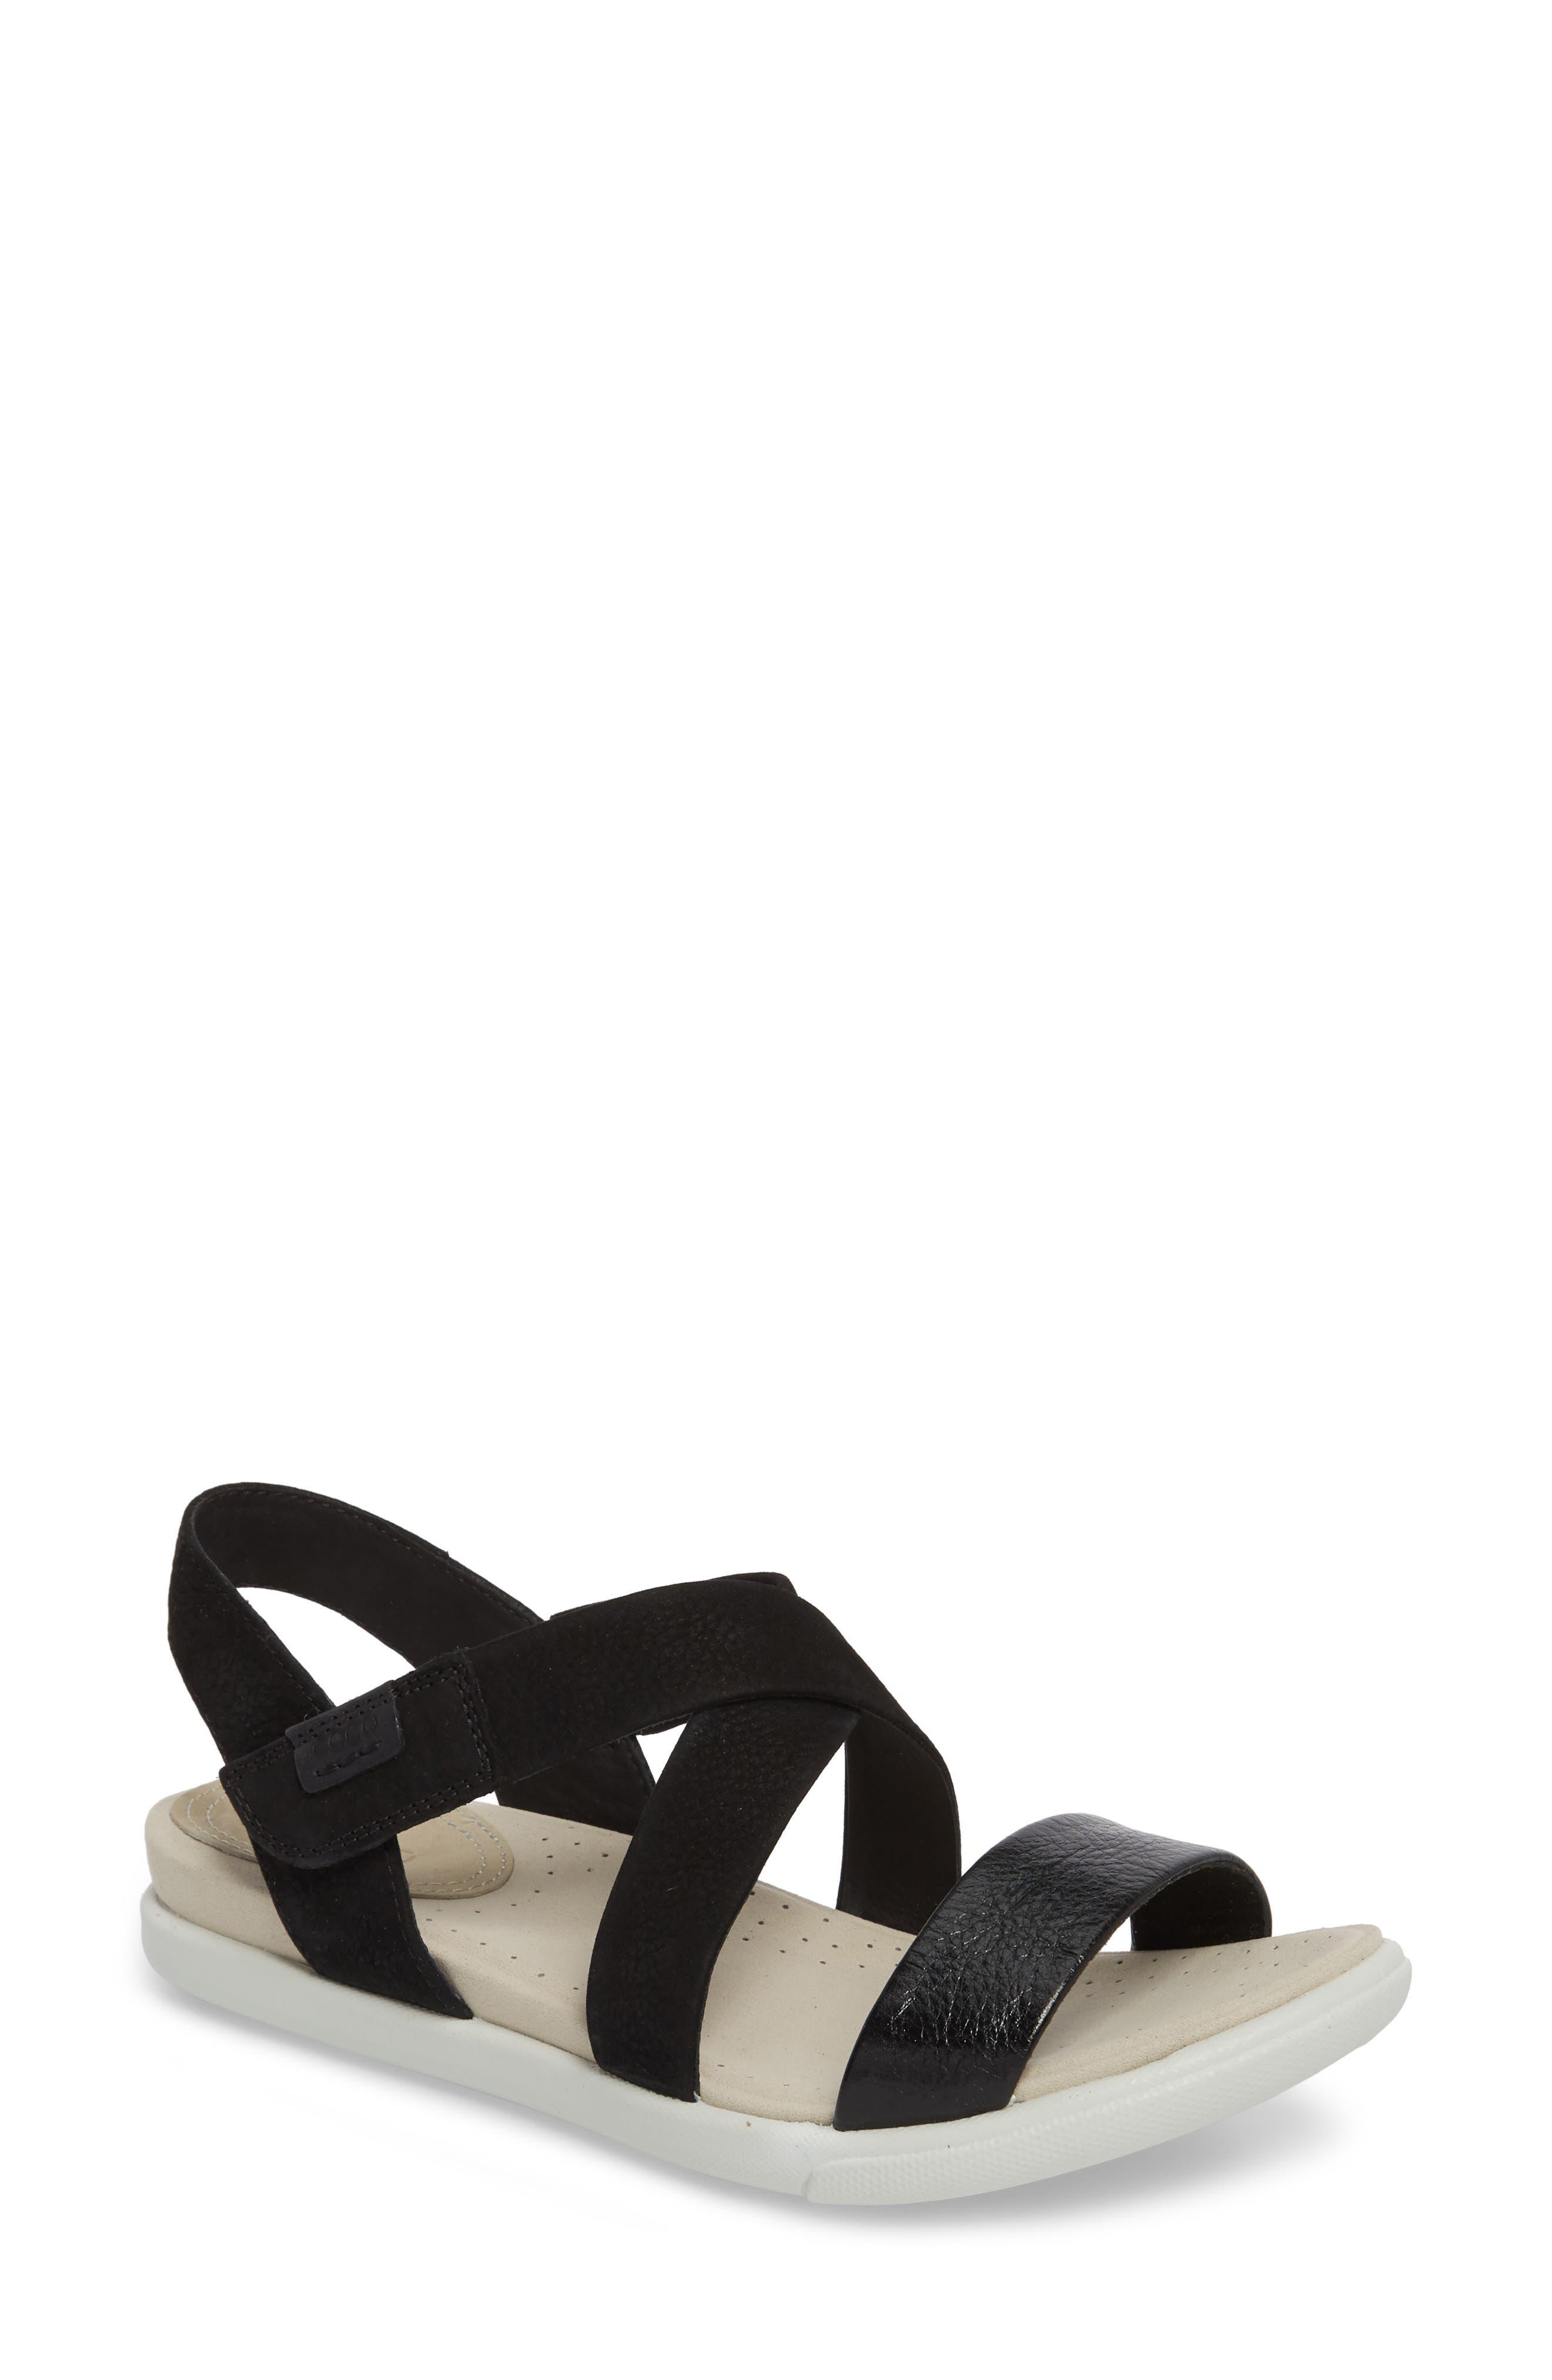 Damara Cross-Strap Sandal,                         Main,                         color, Black Leather